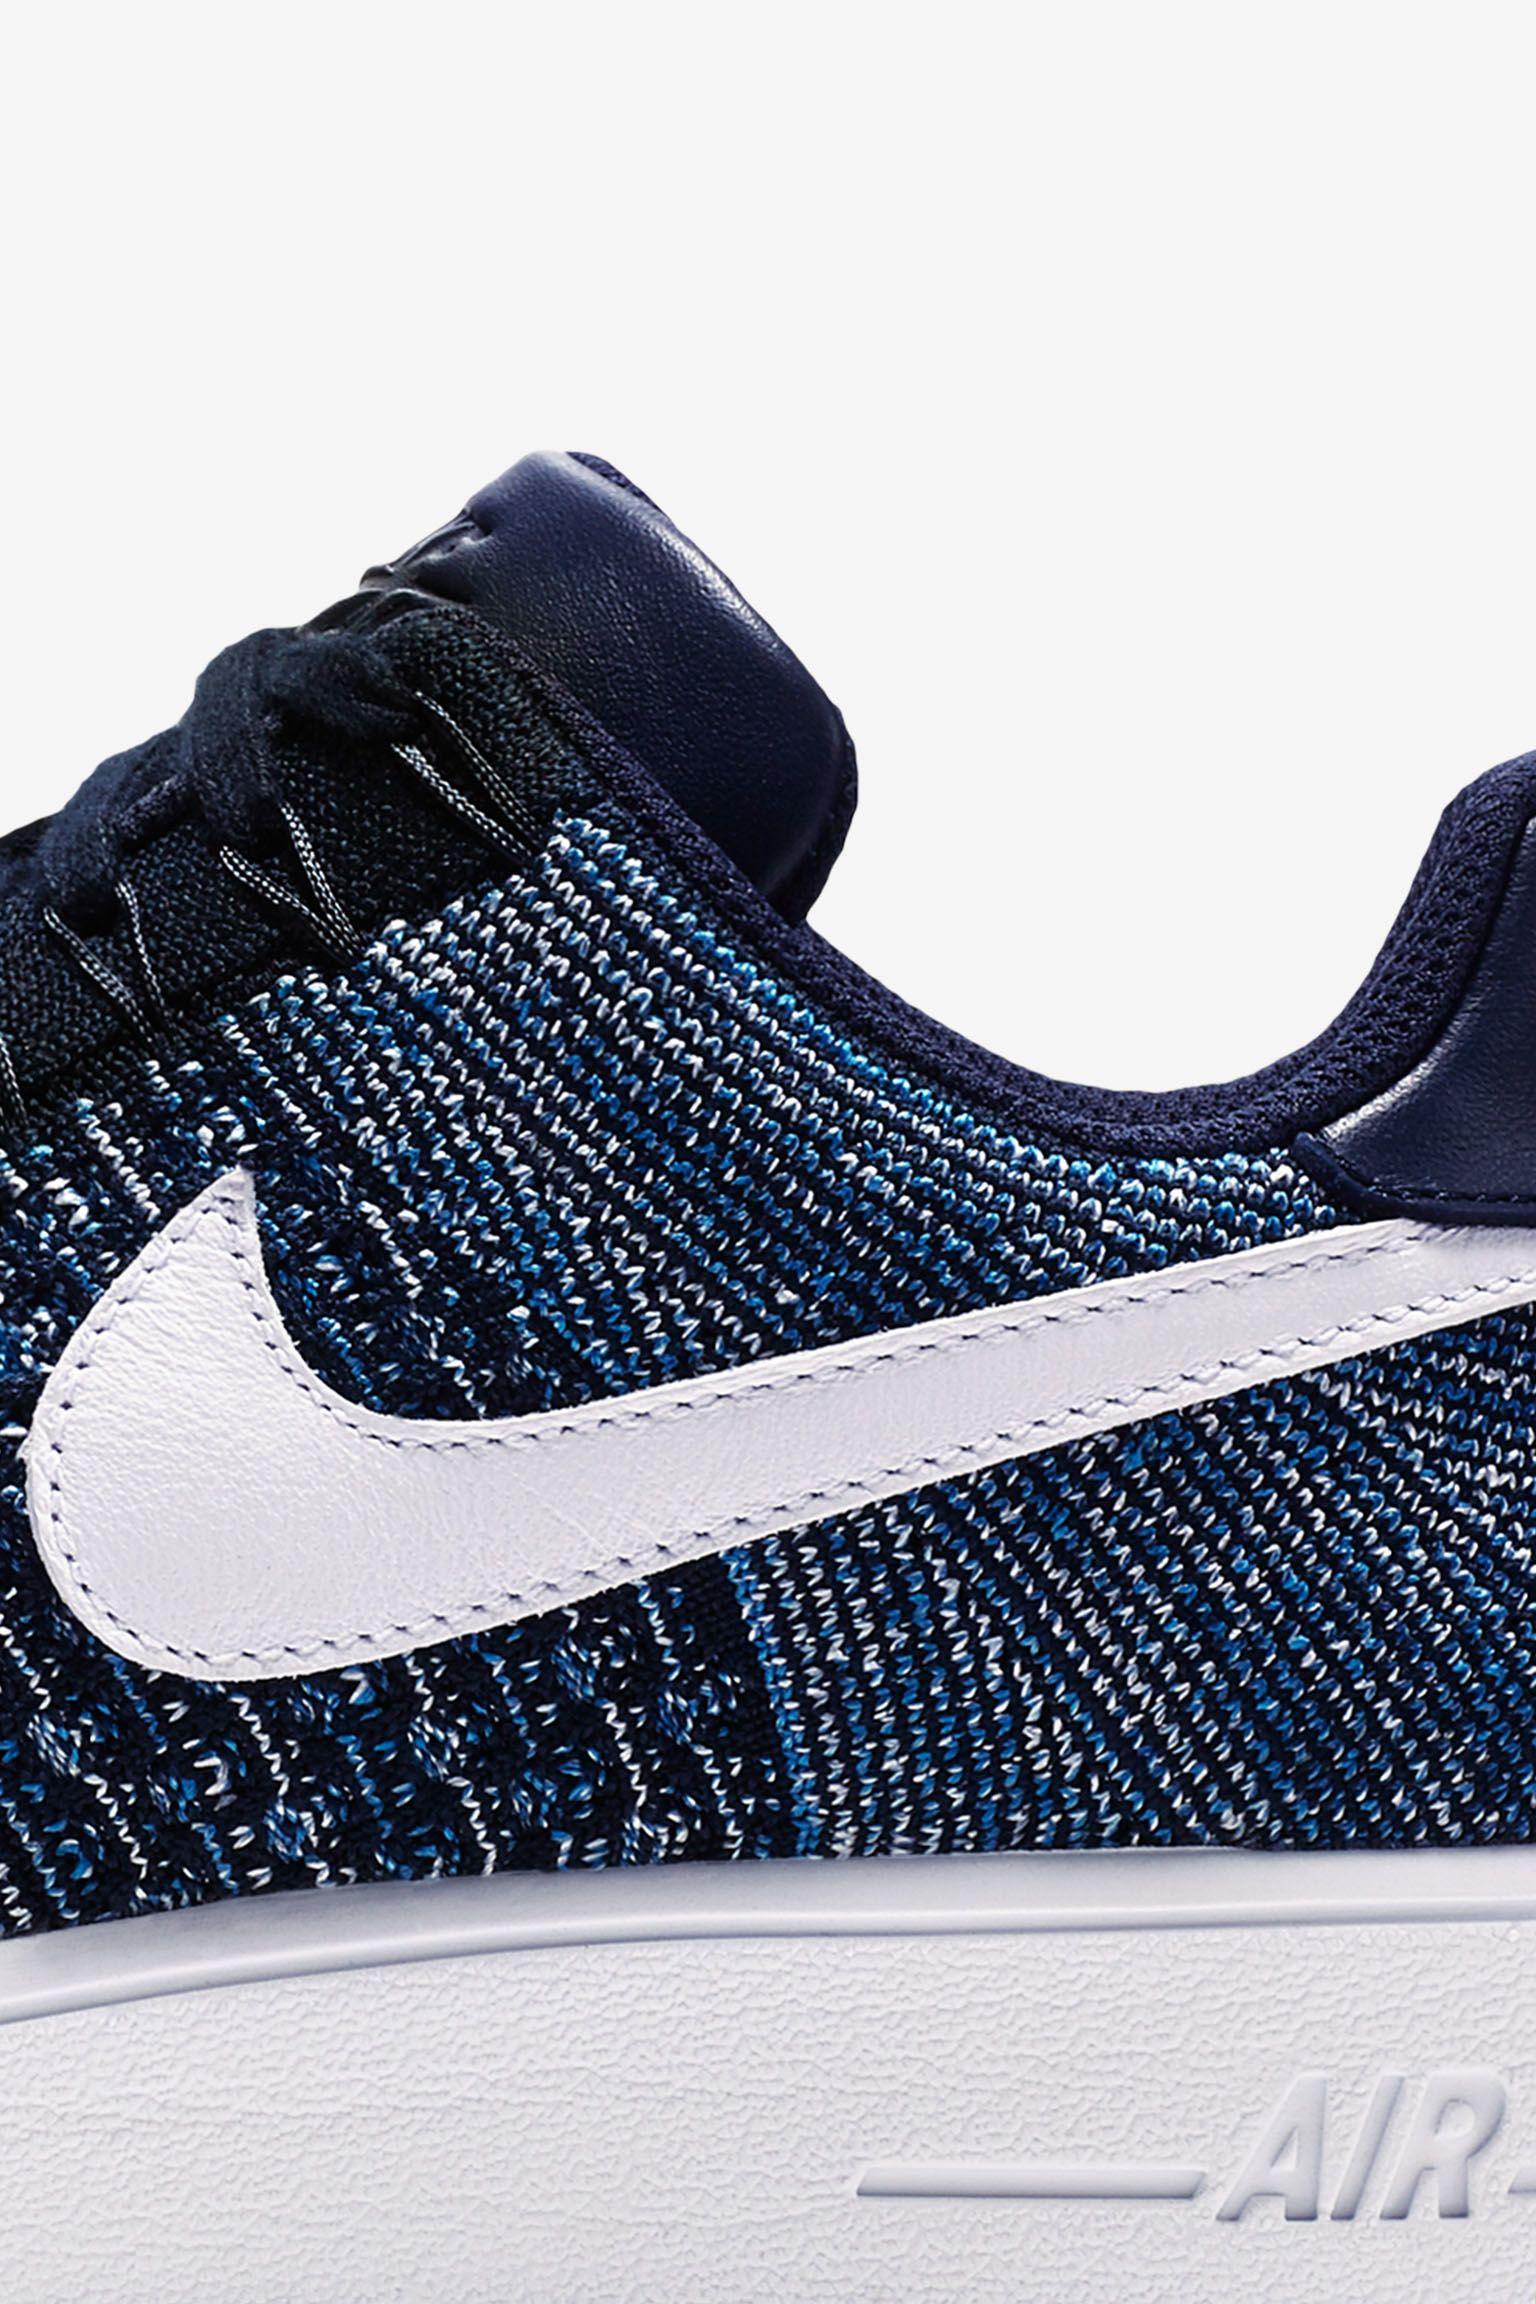 Nike Air Force 1 Ultra Flyknit Low 'Summer Blues' Release Date